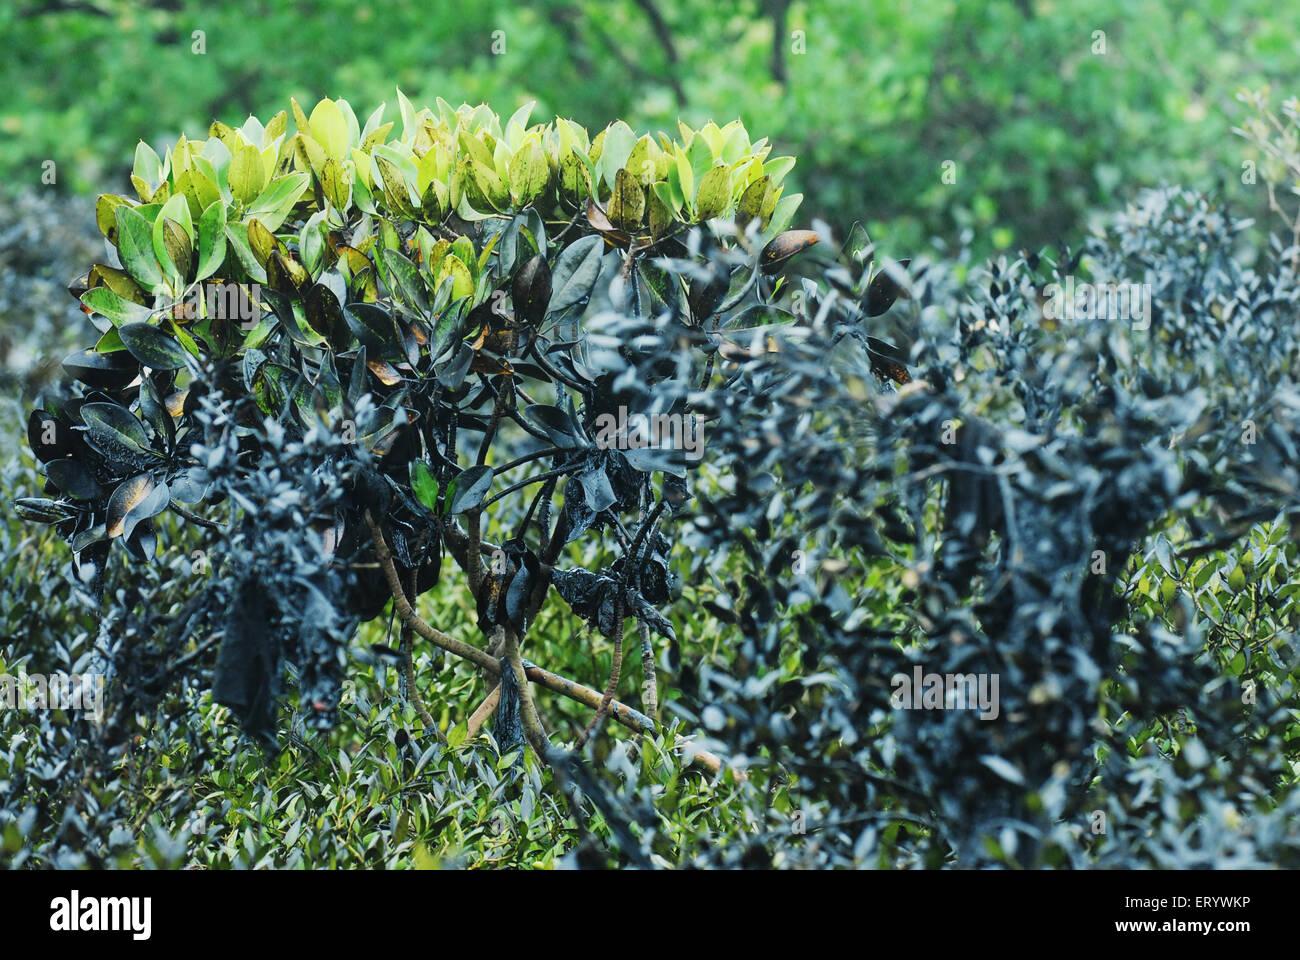 Mangroves affected by oil spill at ins kunjali ; Colaba; Bombay Mumbai ; Maharashtra ; India - Stock Image